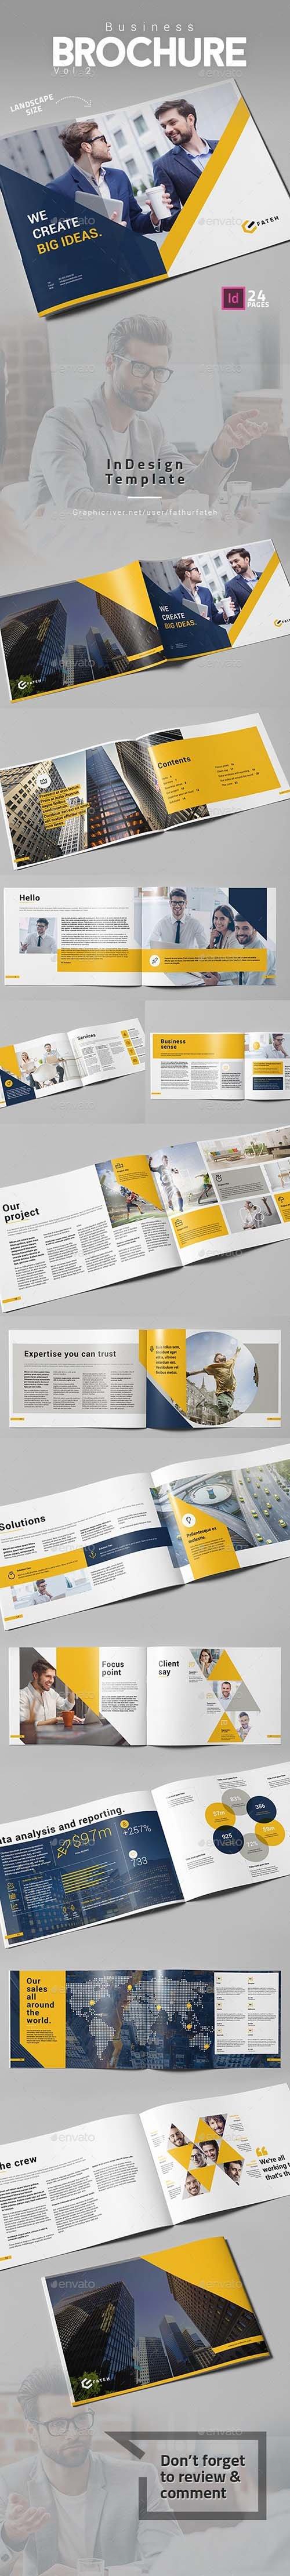 Business Brochure Vol.2 Landscape 19977774